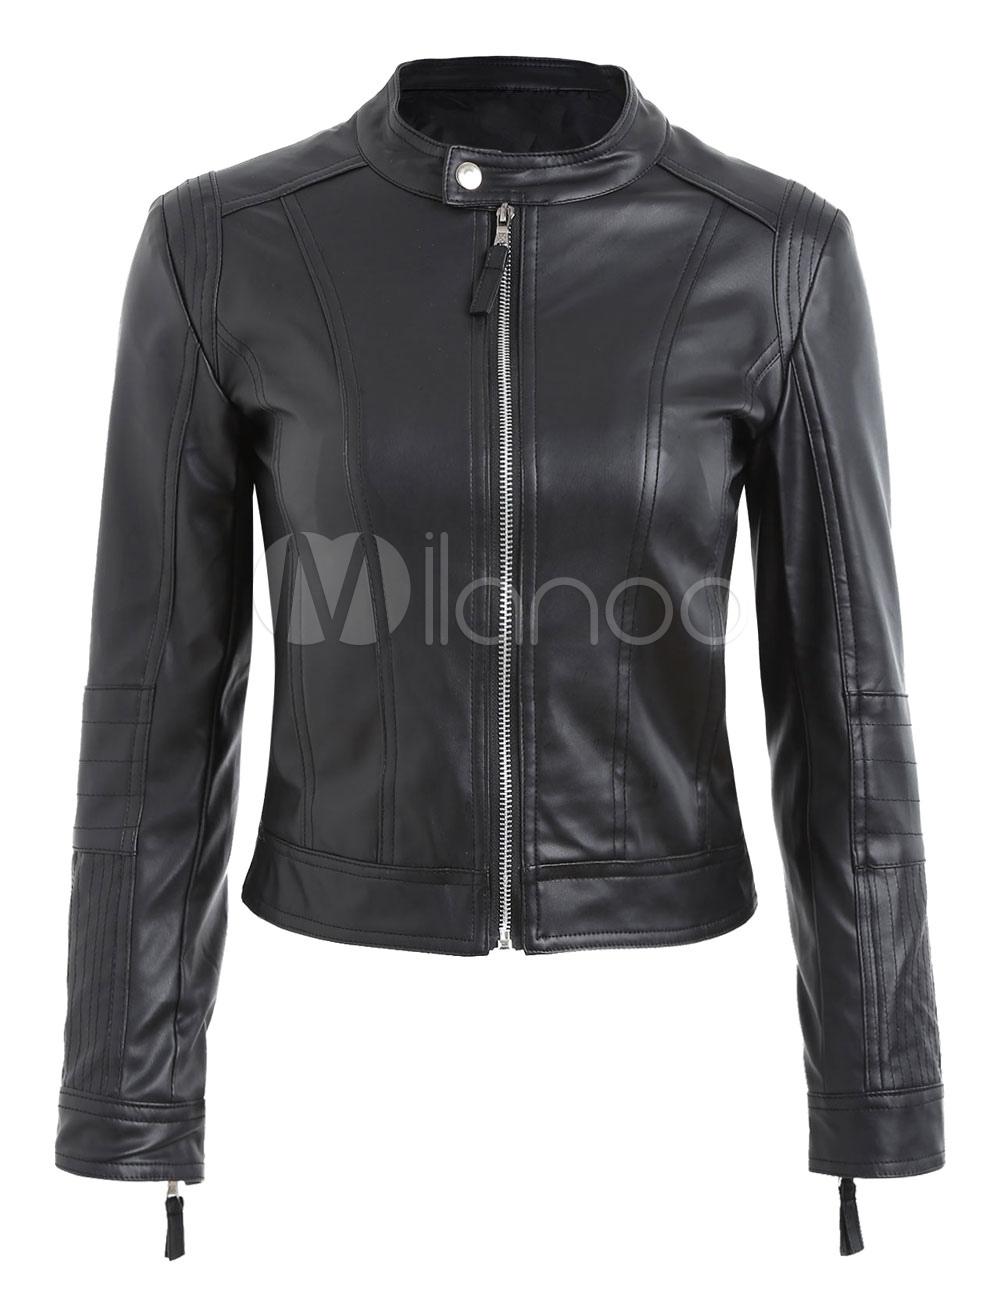 Black Moto Jacket Long Sleeve Crewneck Boyfriend Women's PU Leather Jackets